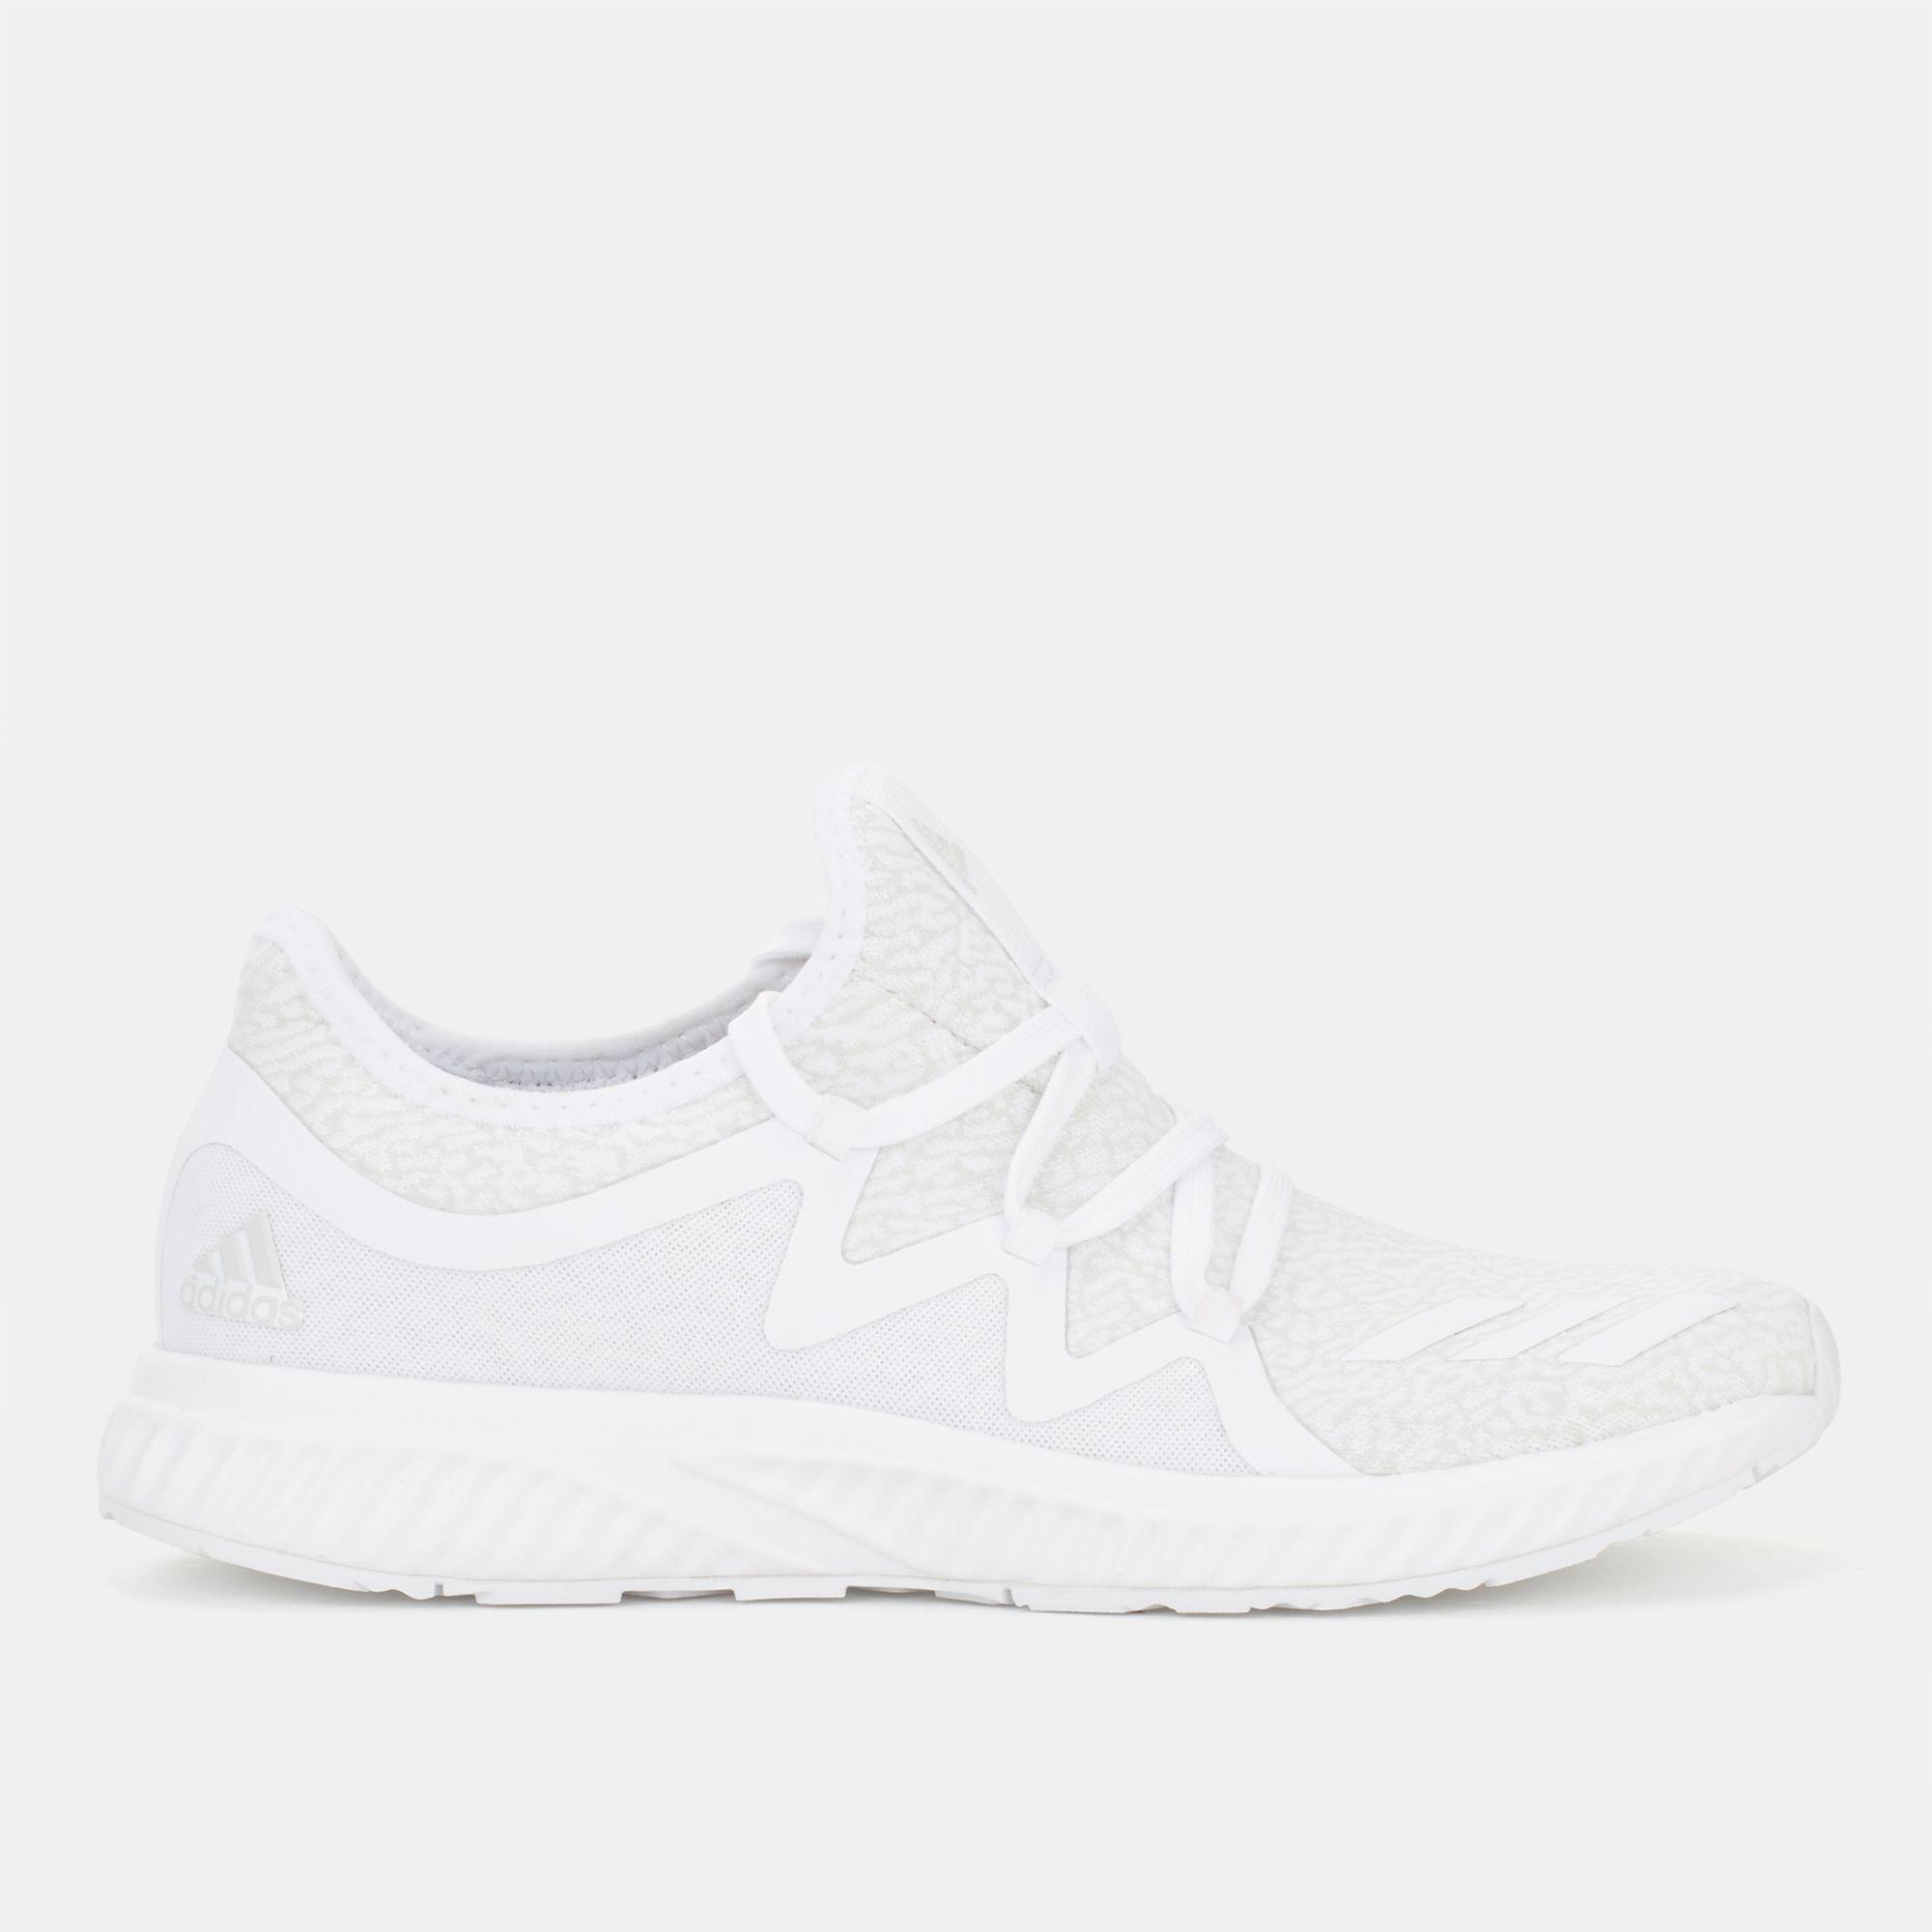 eeb6695e1 Shop White adidas Manazero Running Shoe for Womens by adidas